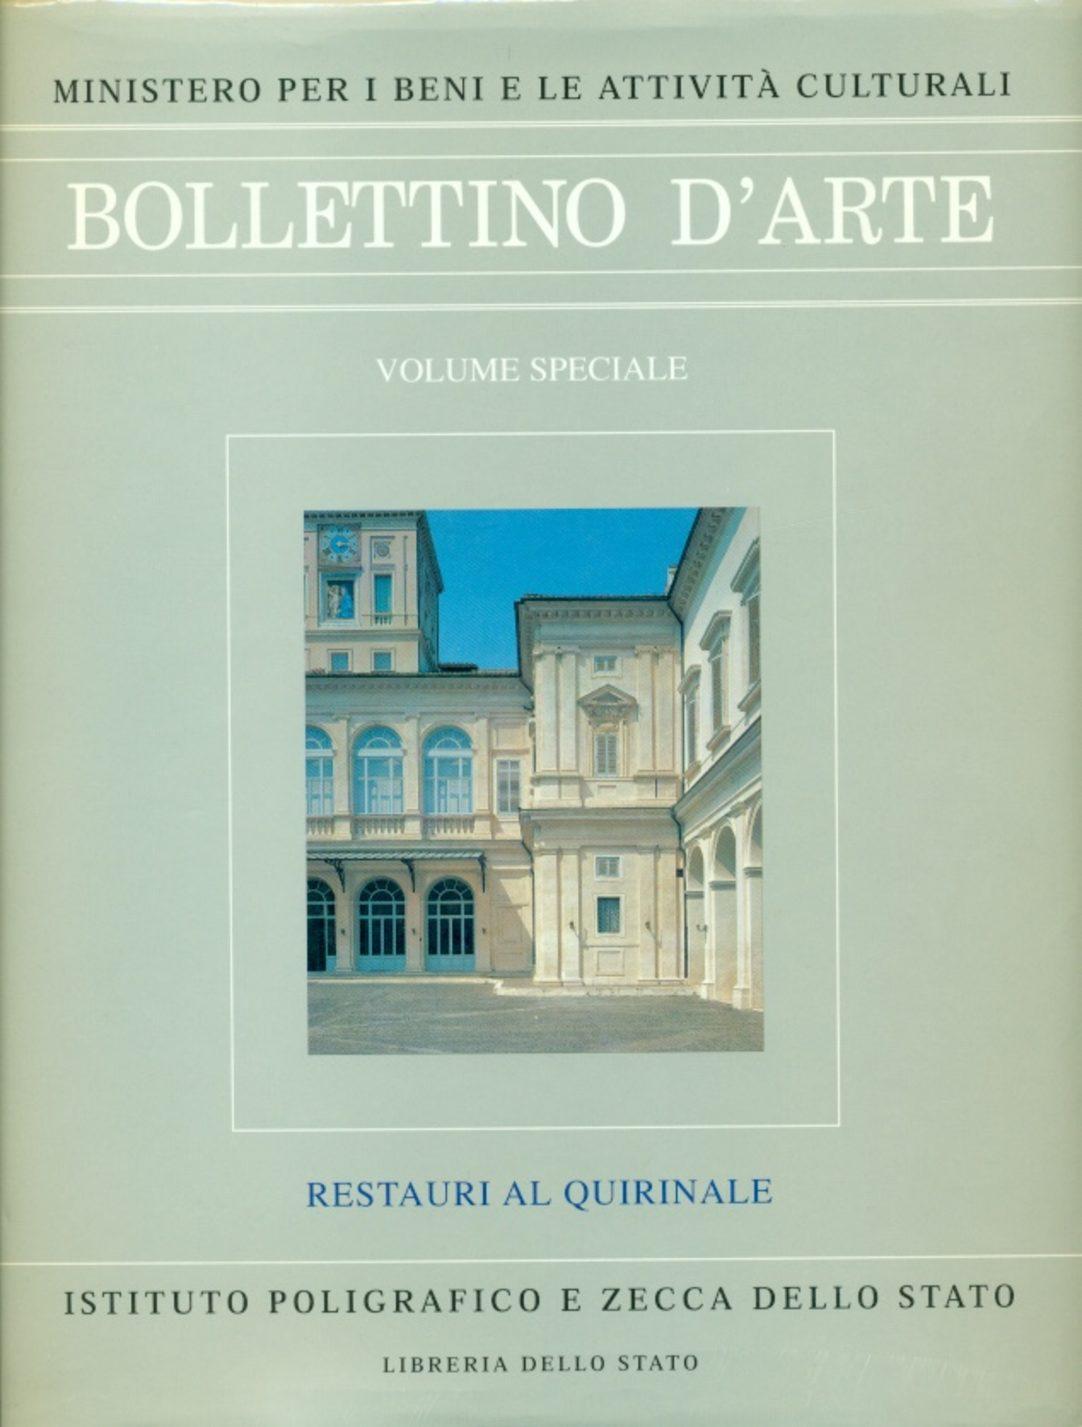 http://cbccoop.it/app/uploads/2017/06/COP-Sala-delle-Dame-e-Alessandro-VII-pdf.jpg